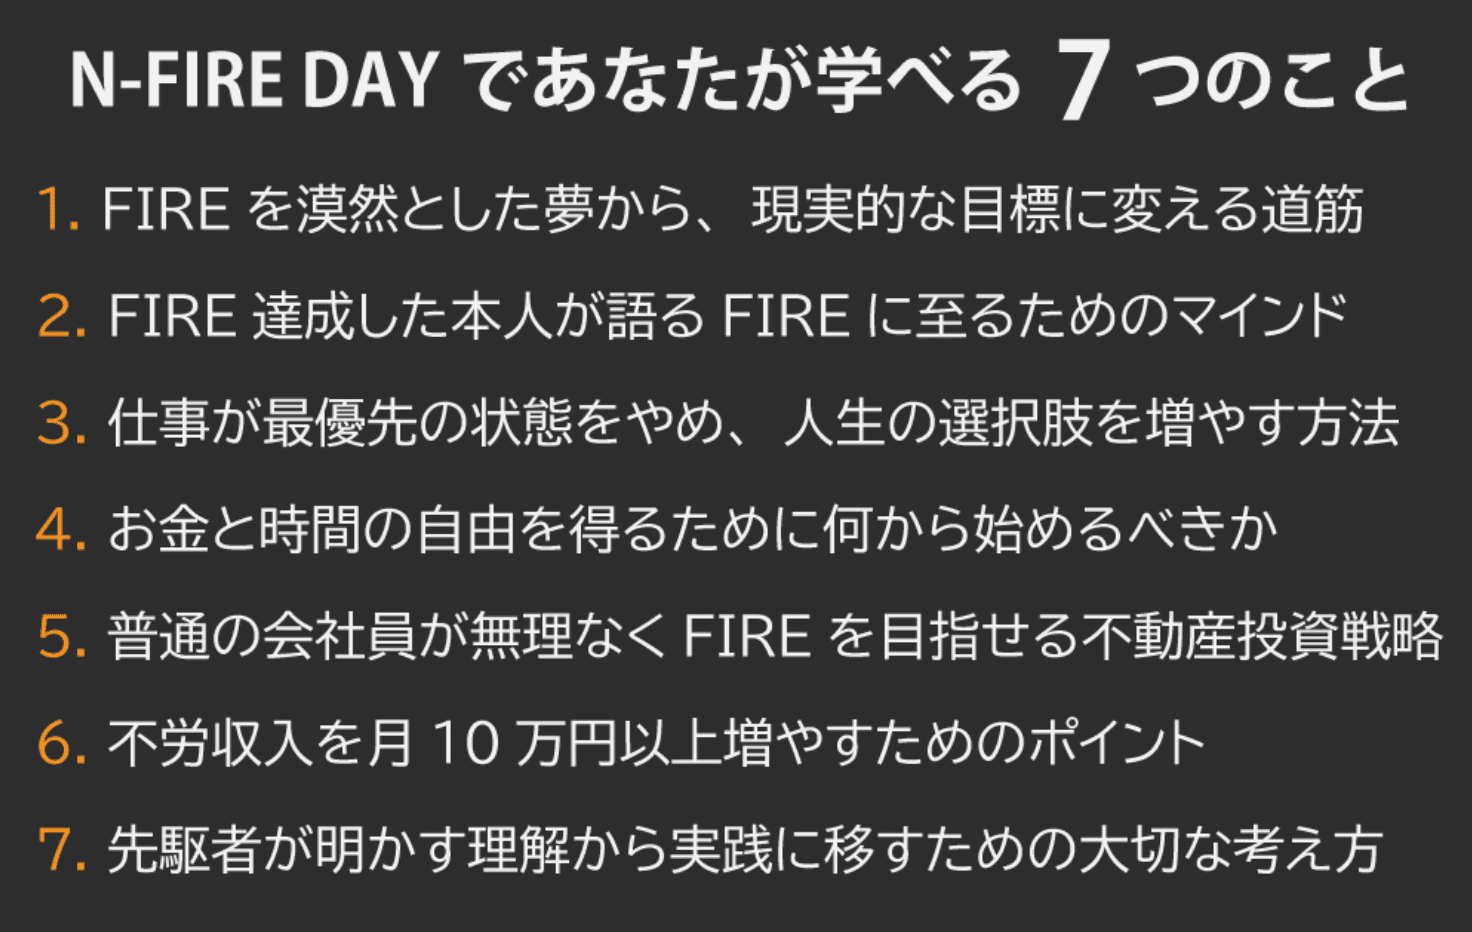 N-FIRE-DAY-ONLINE-先駆者から不動産投資×FIREを学ぶオンラインイベント (1)